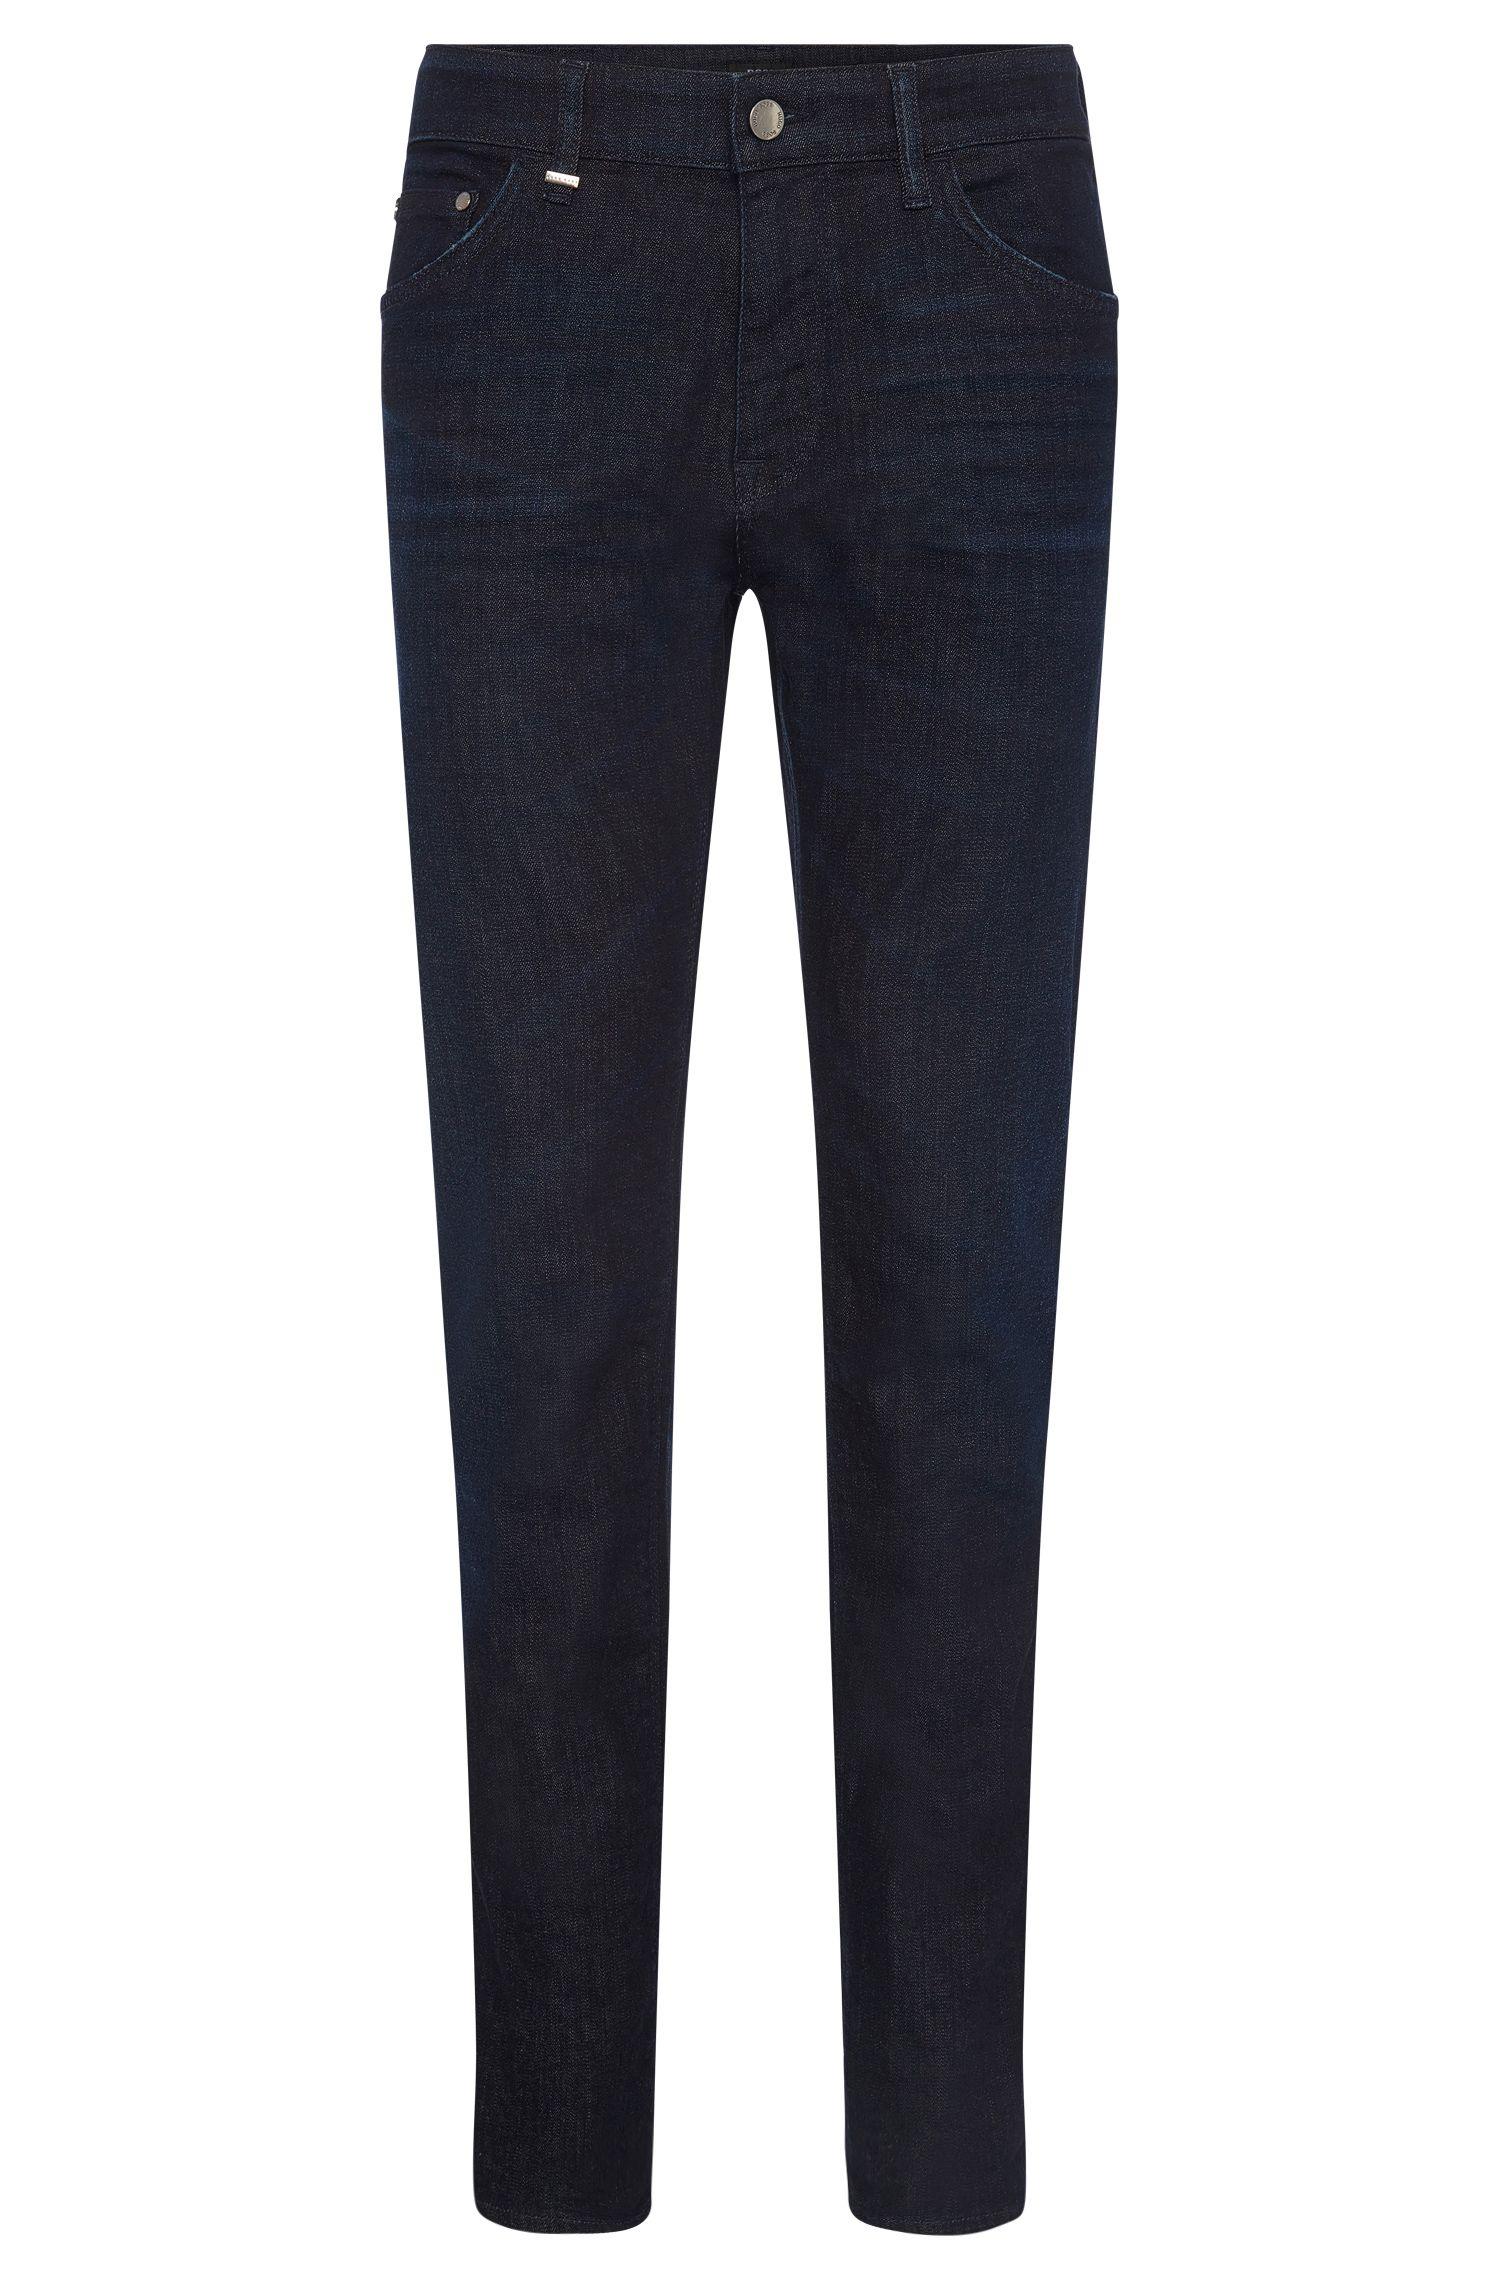 'Maine' | Regular Fit, 11 oz Stretch Cotton Jeans